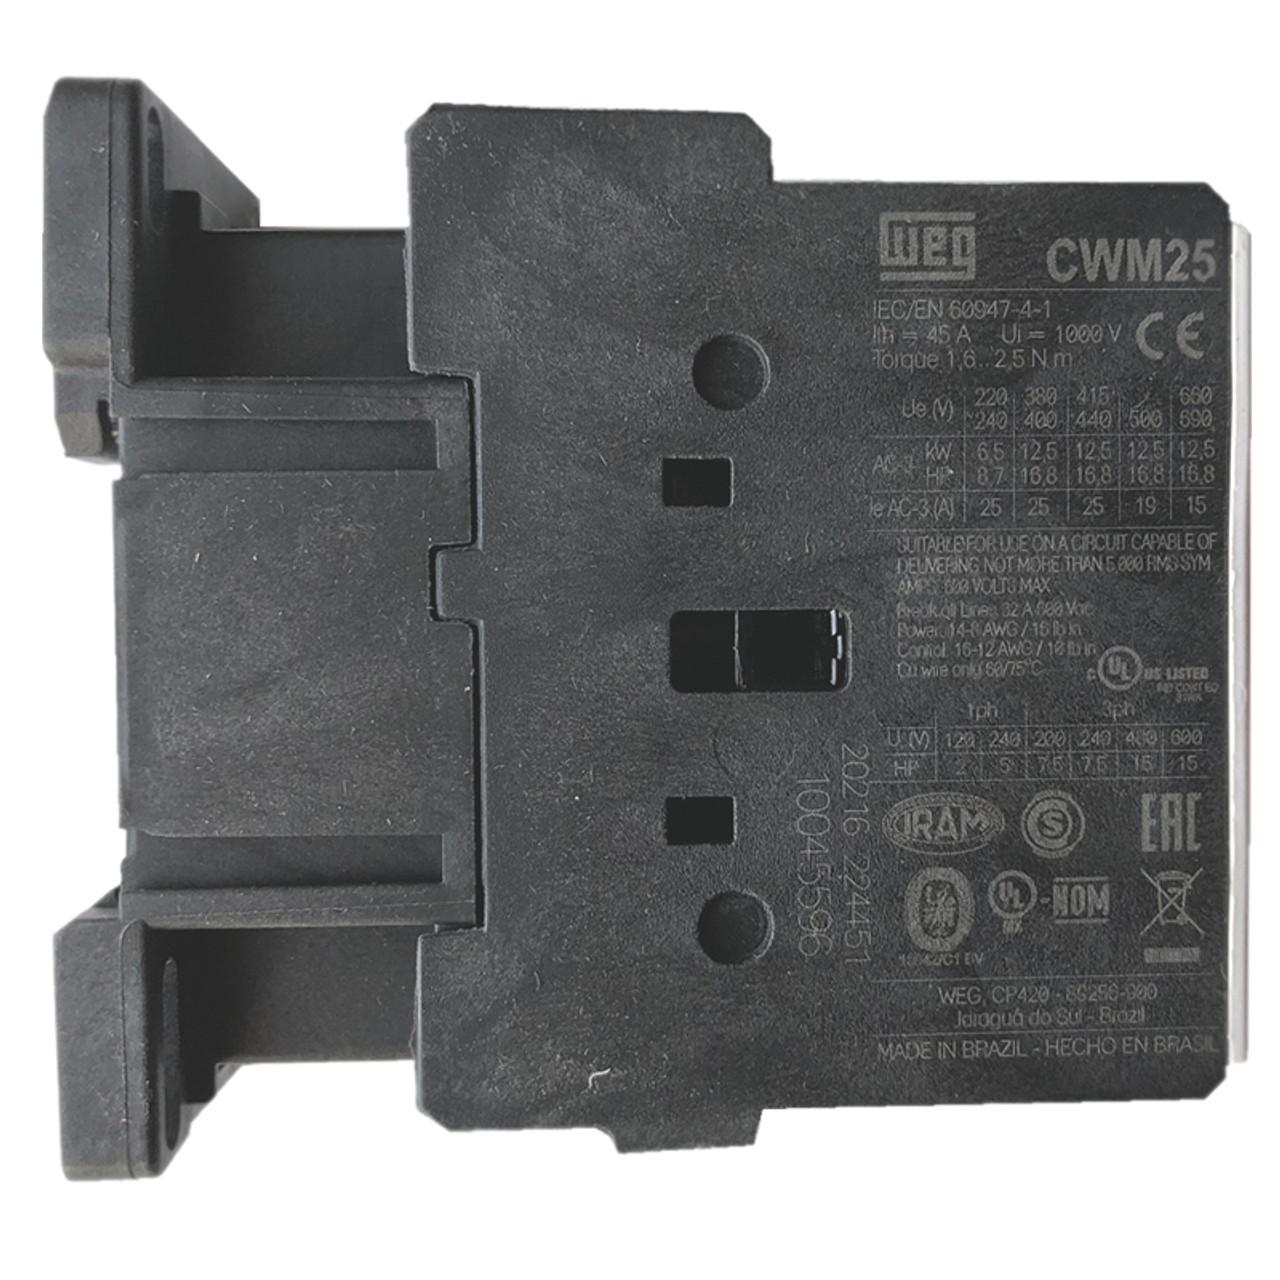 WEG CWM25-00-30V18 side label